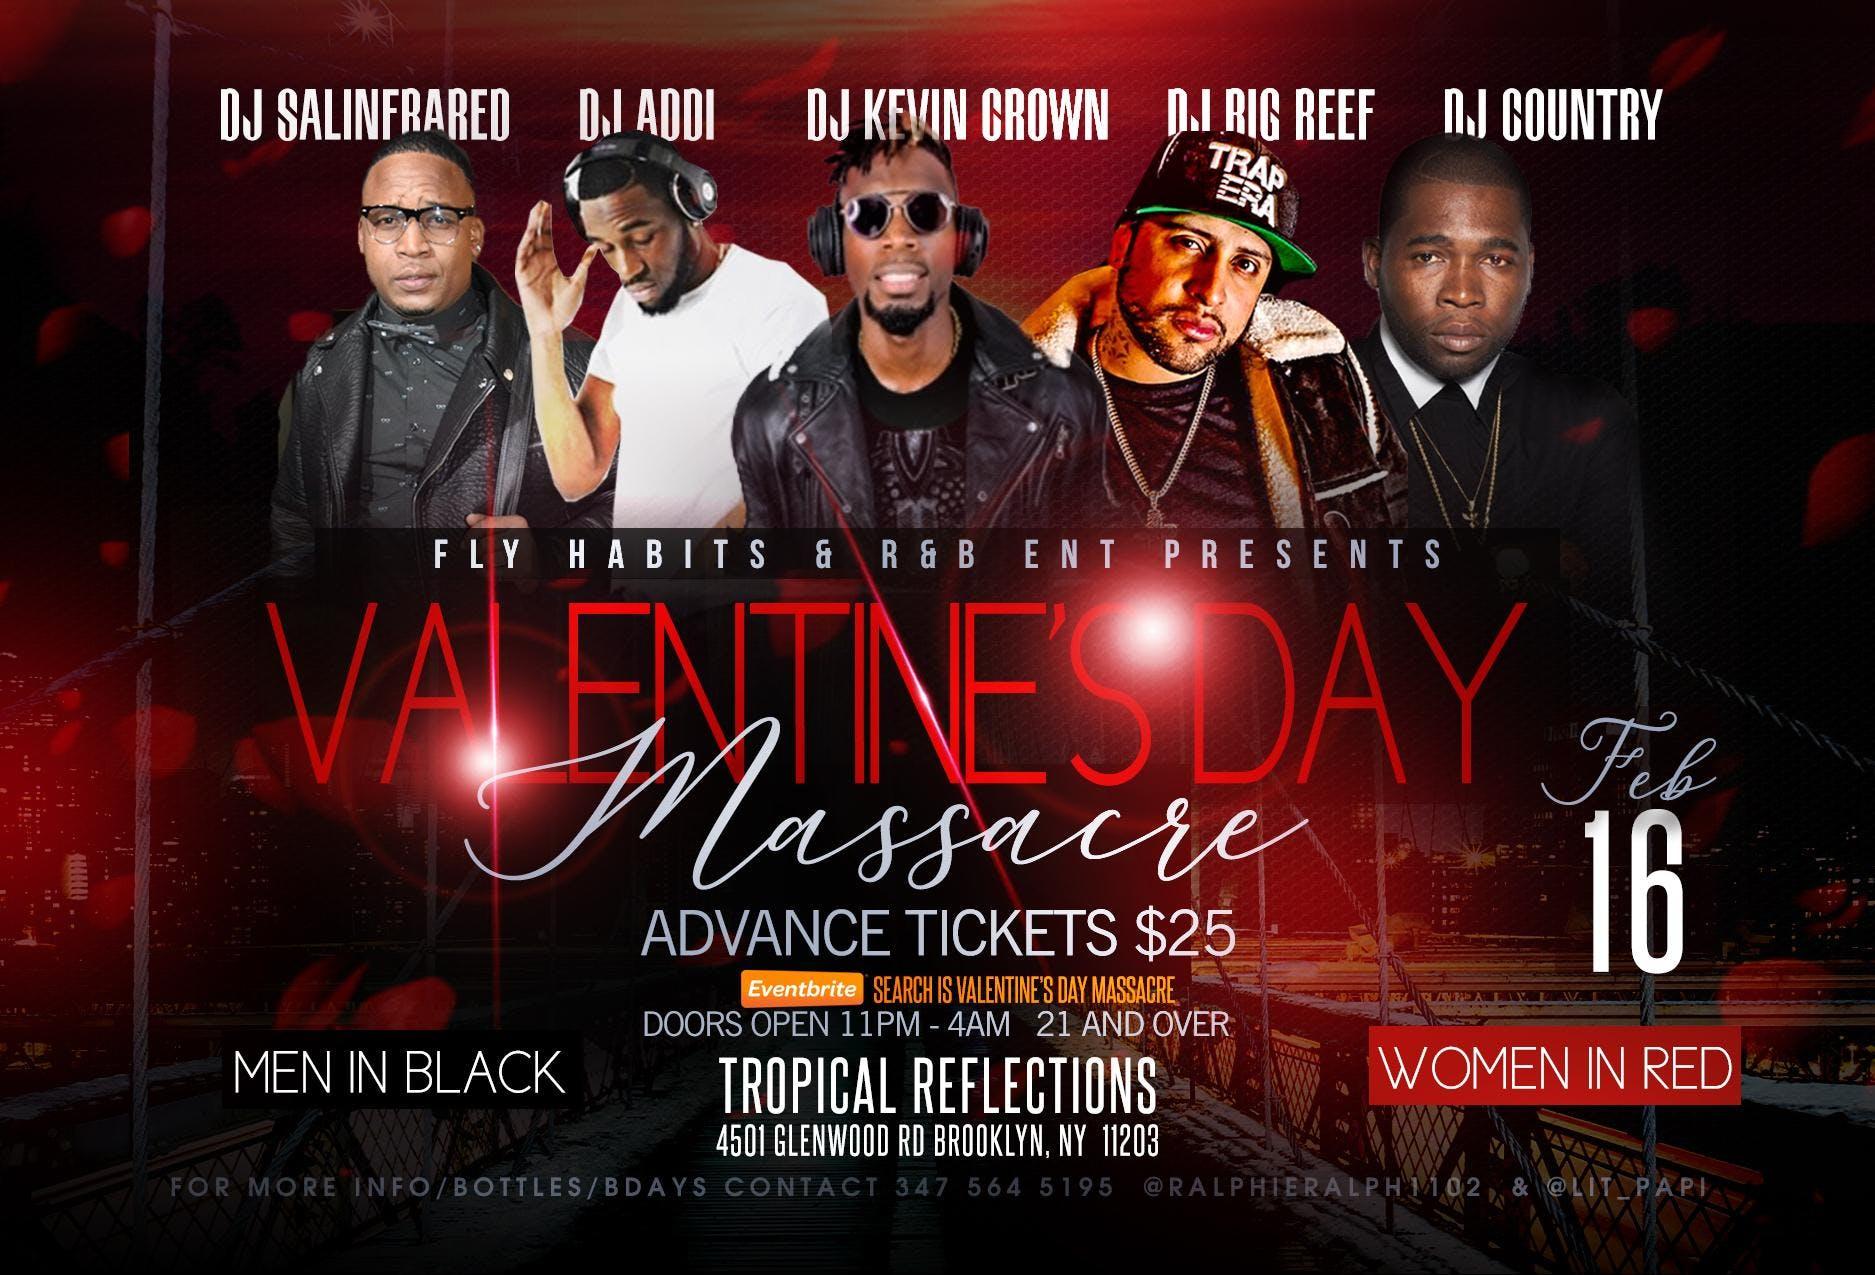 Valentines Day Massacre 16 Feb 2019